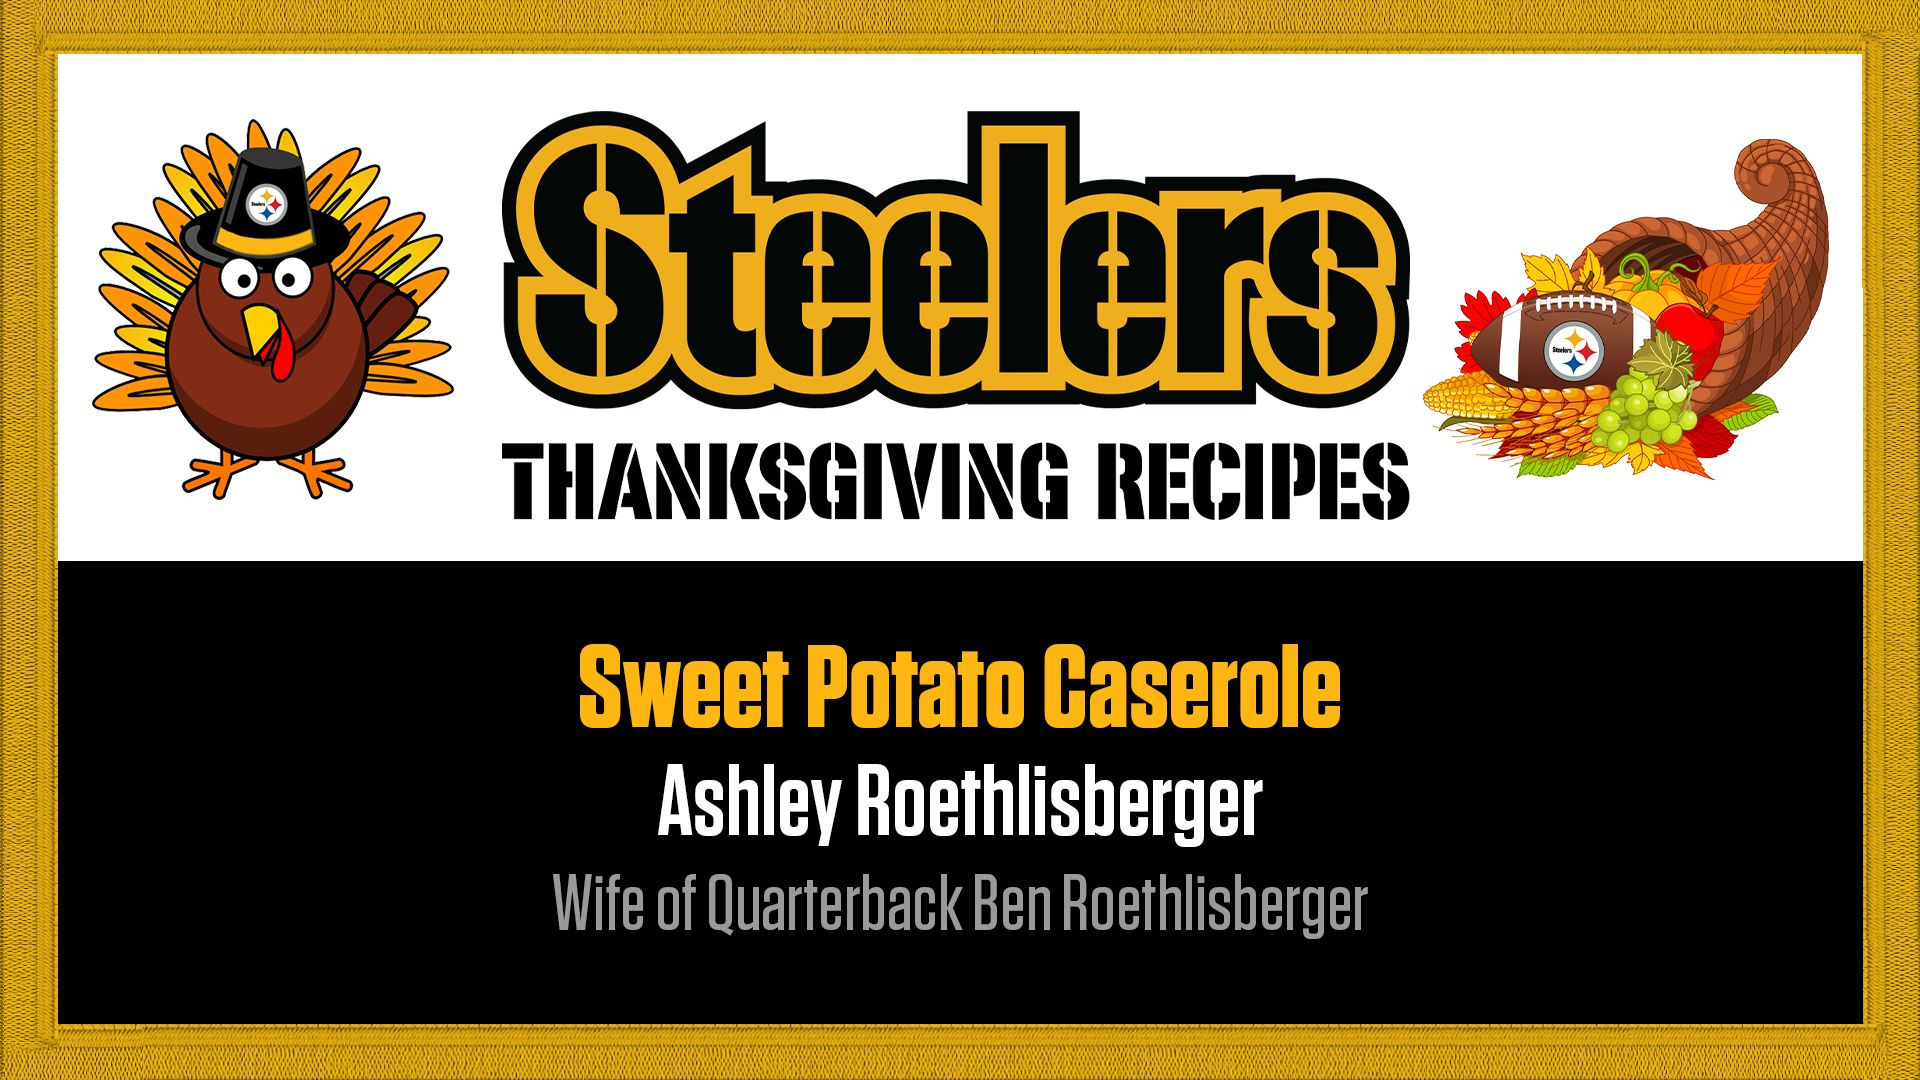 Recipe - sweet potato casserole_ashley roethlisberger